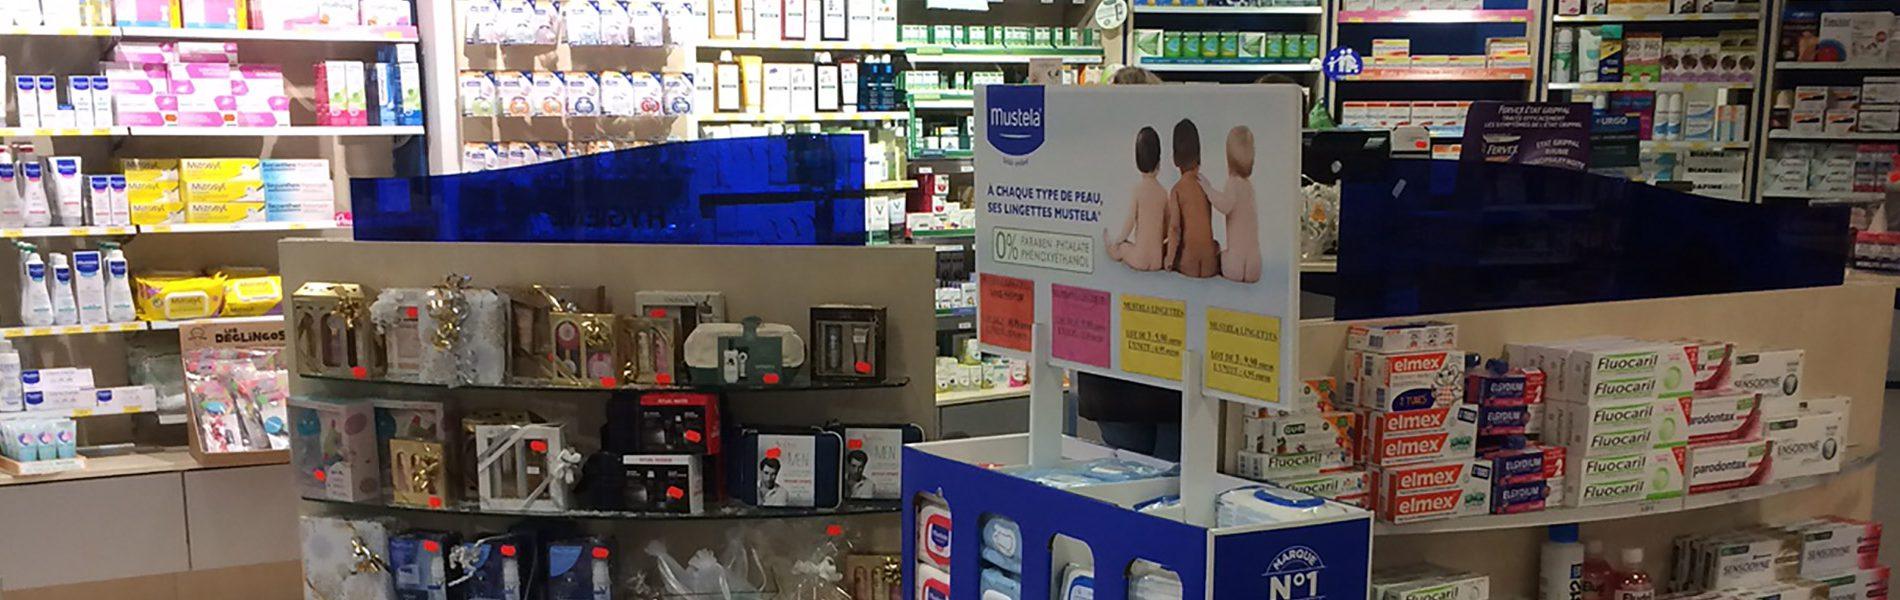 Pharmacie DEUMIER - Image Homepage 2